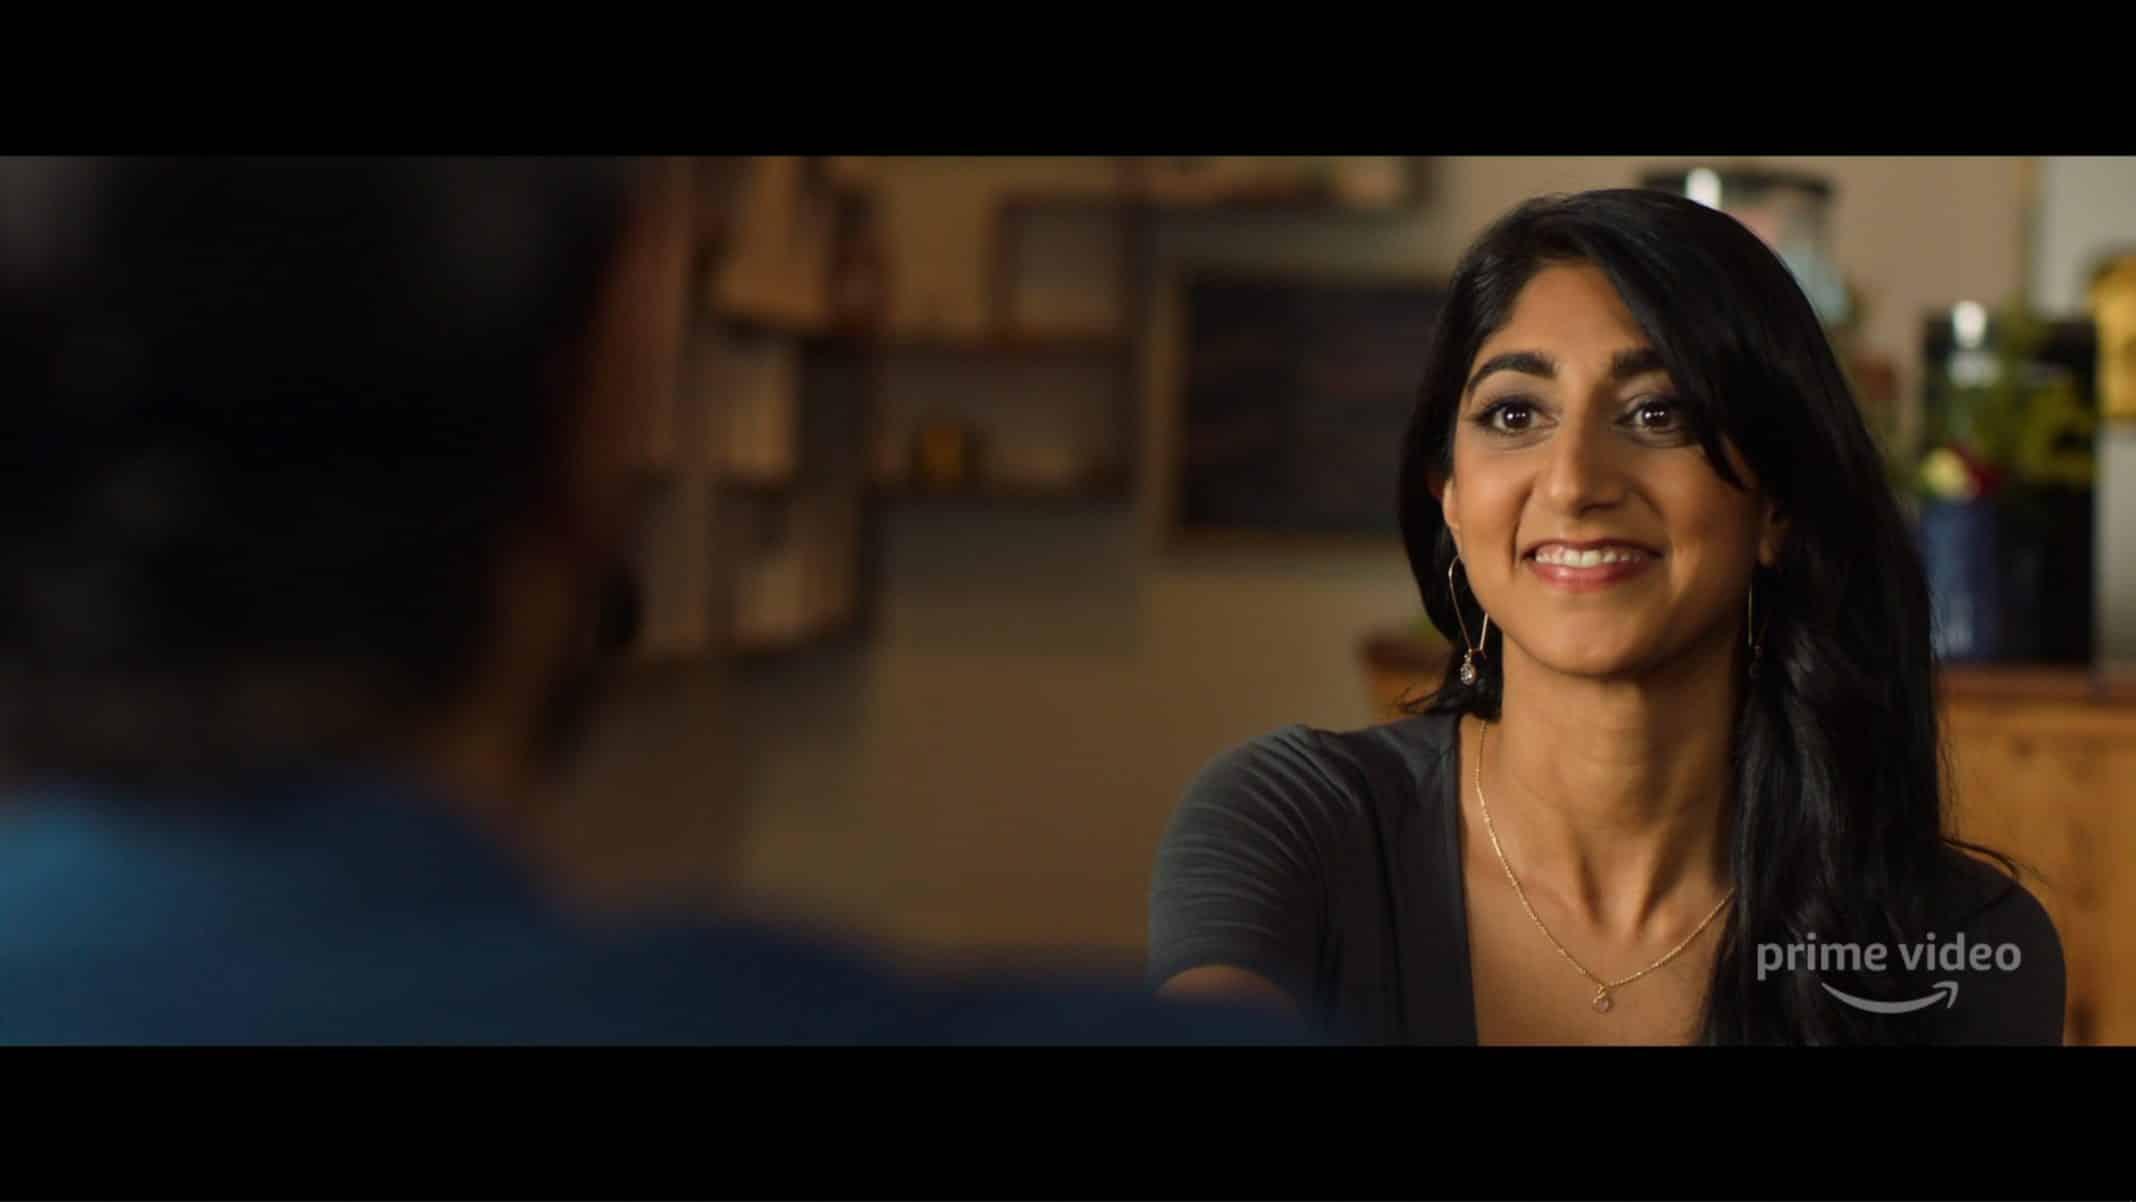 Pallavi (Sunita Mani) when talking to Sandeep